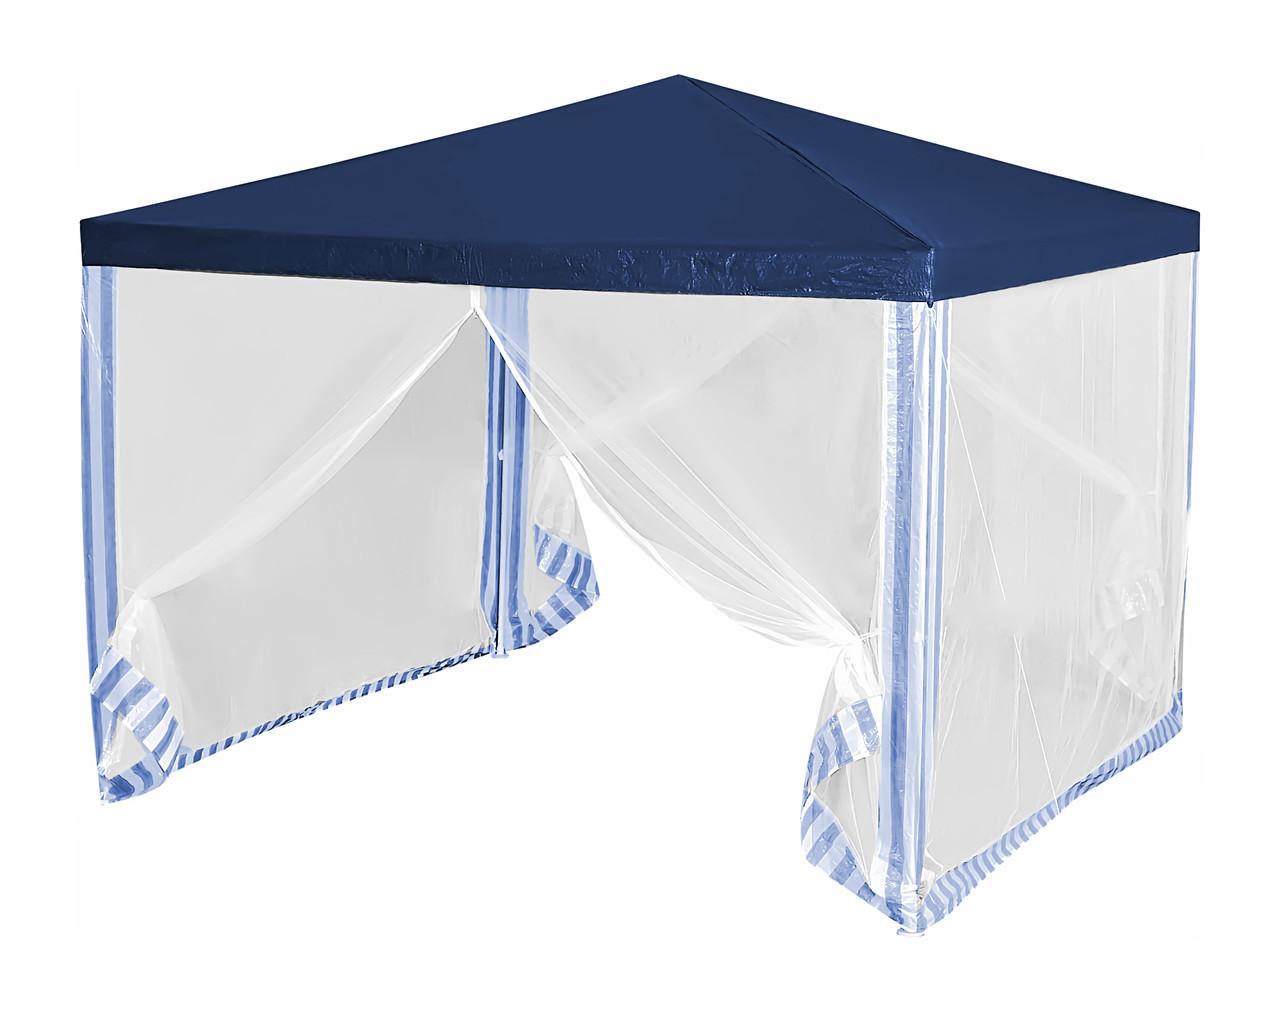 Тент палатка садовая, шатер для дачи